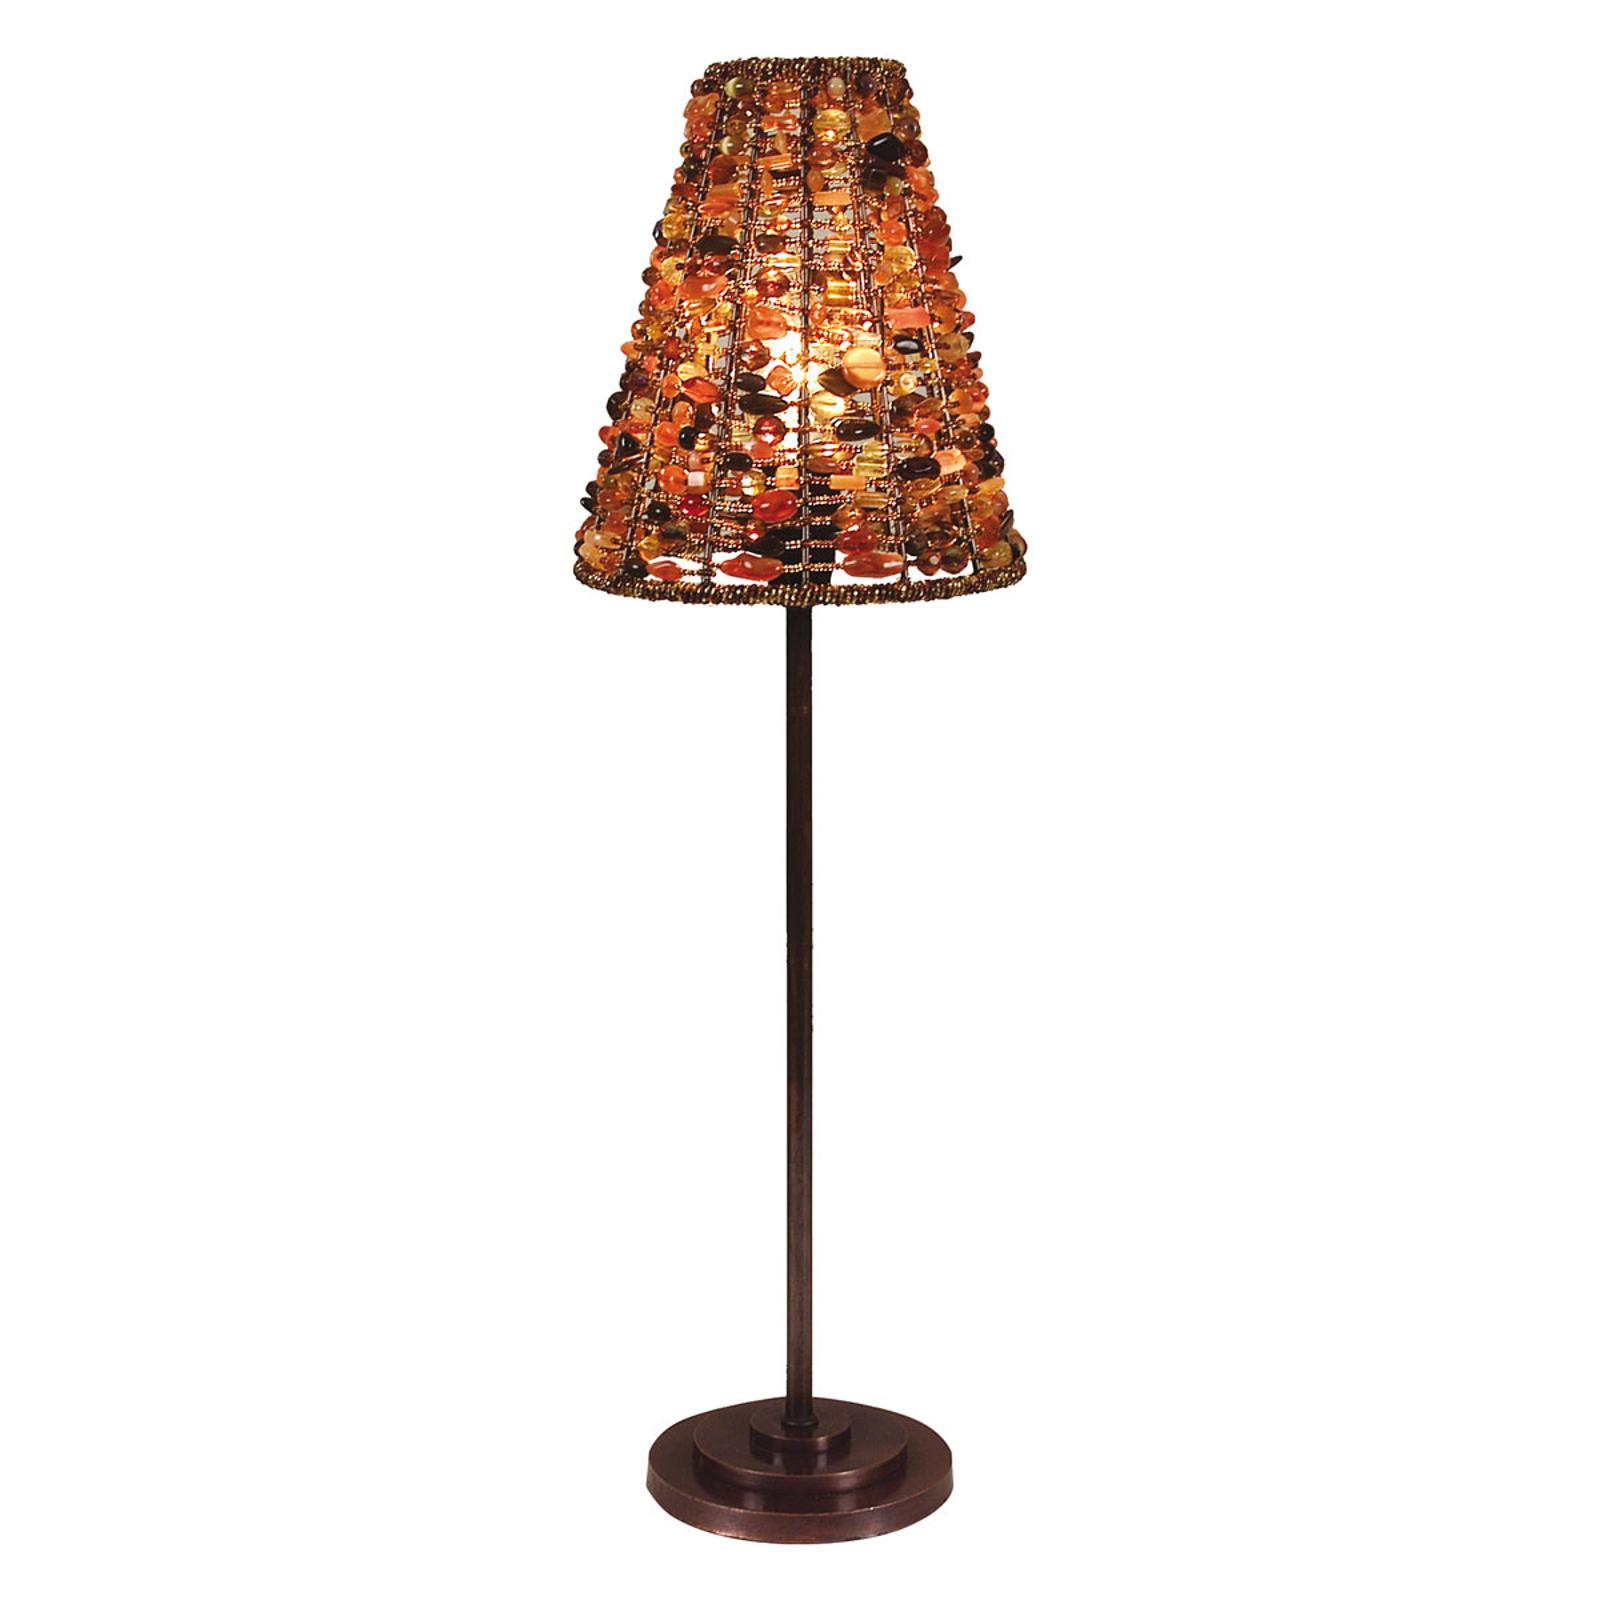 Tafellamp Bella met ronde kap/voet